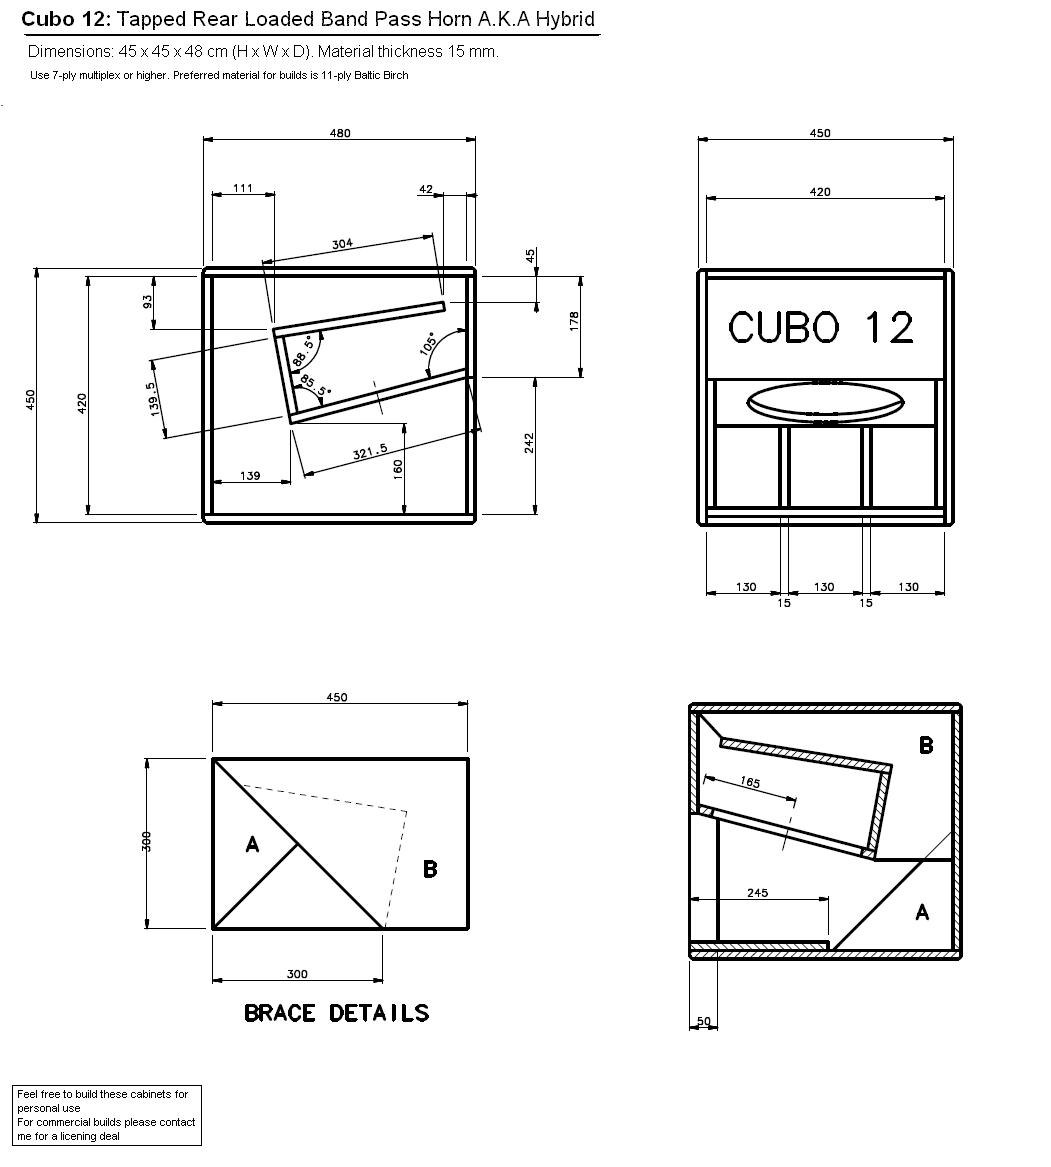 12 Subwoofer Box Diagram Free Download • Oasis-dl.co